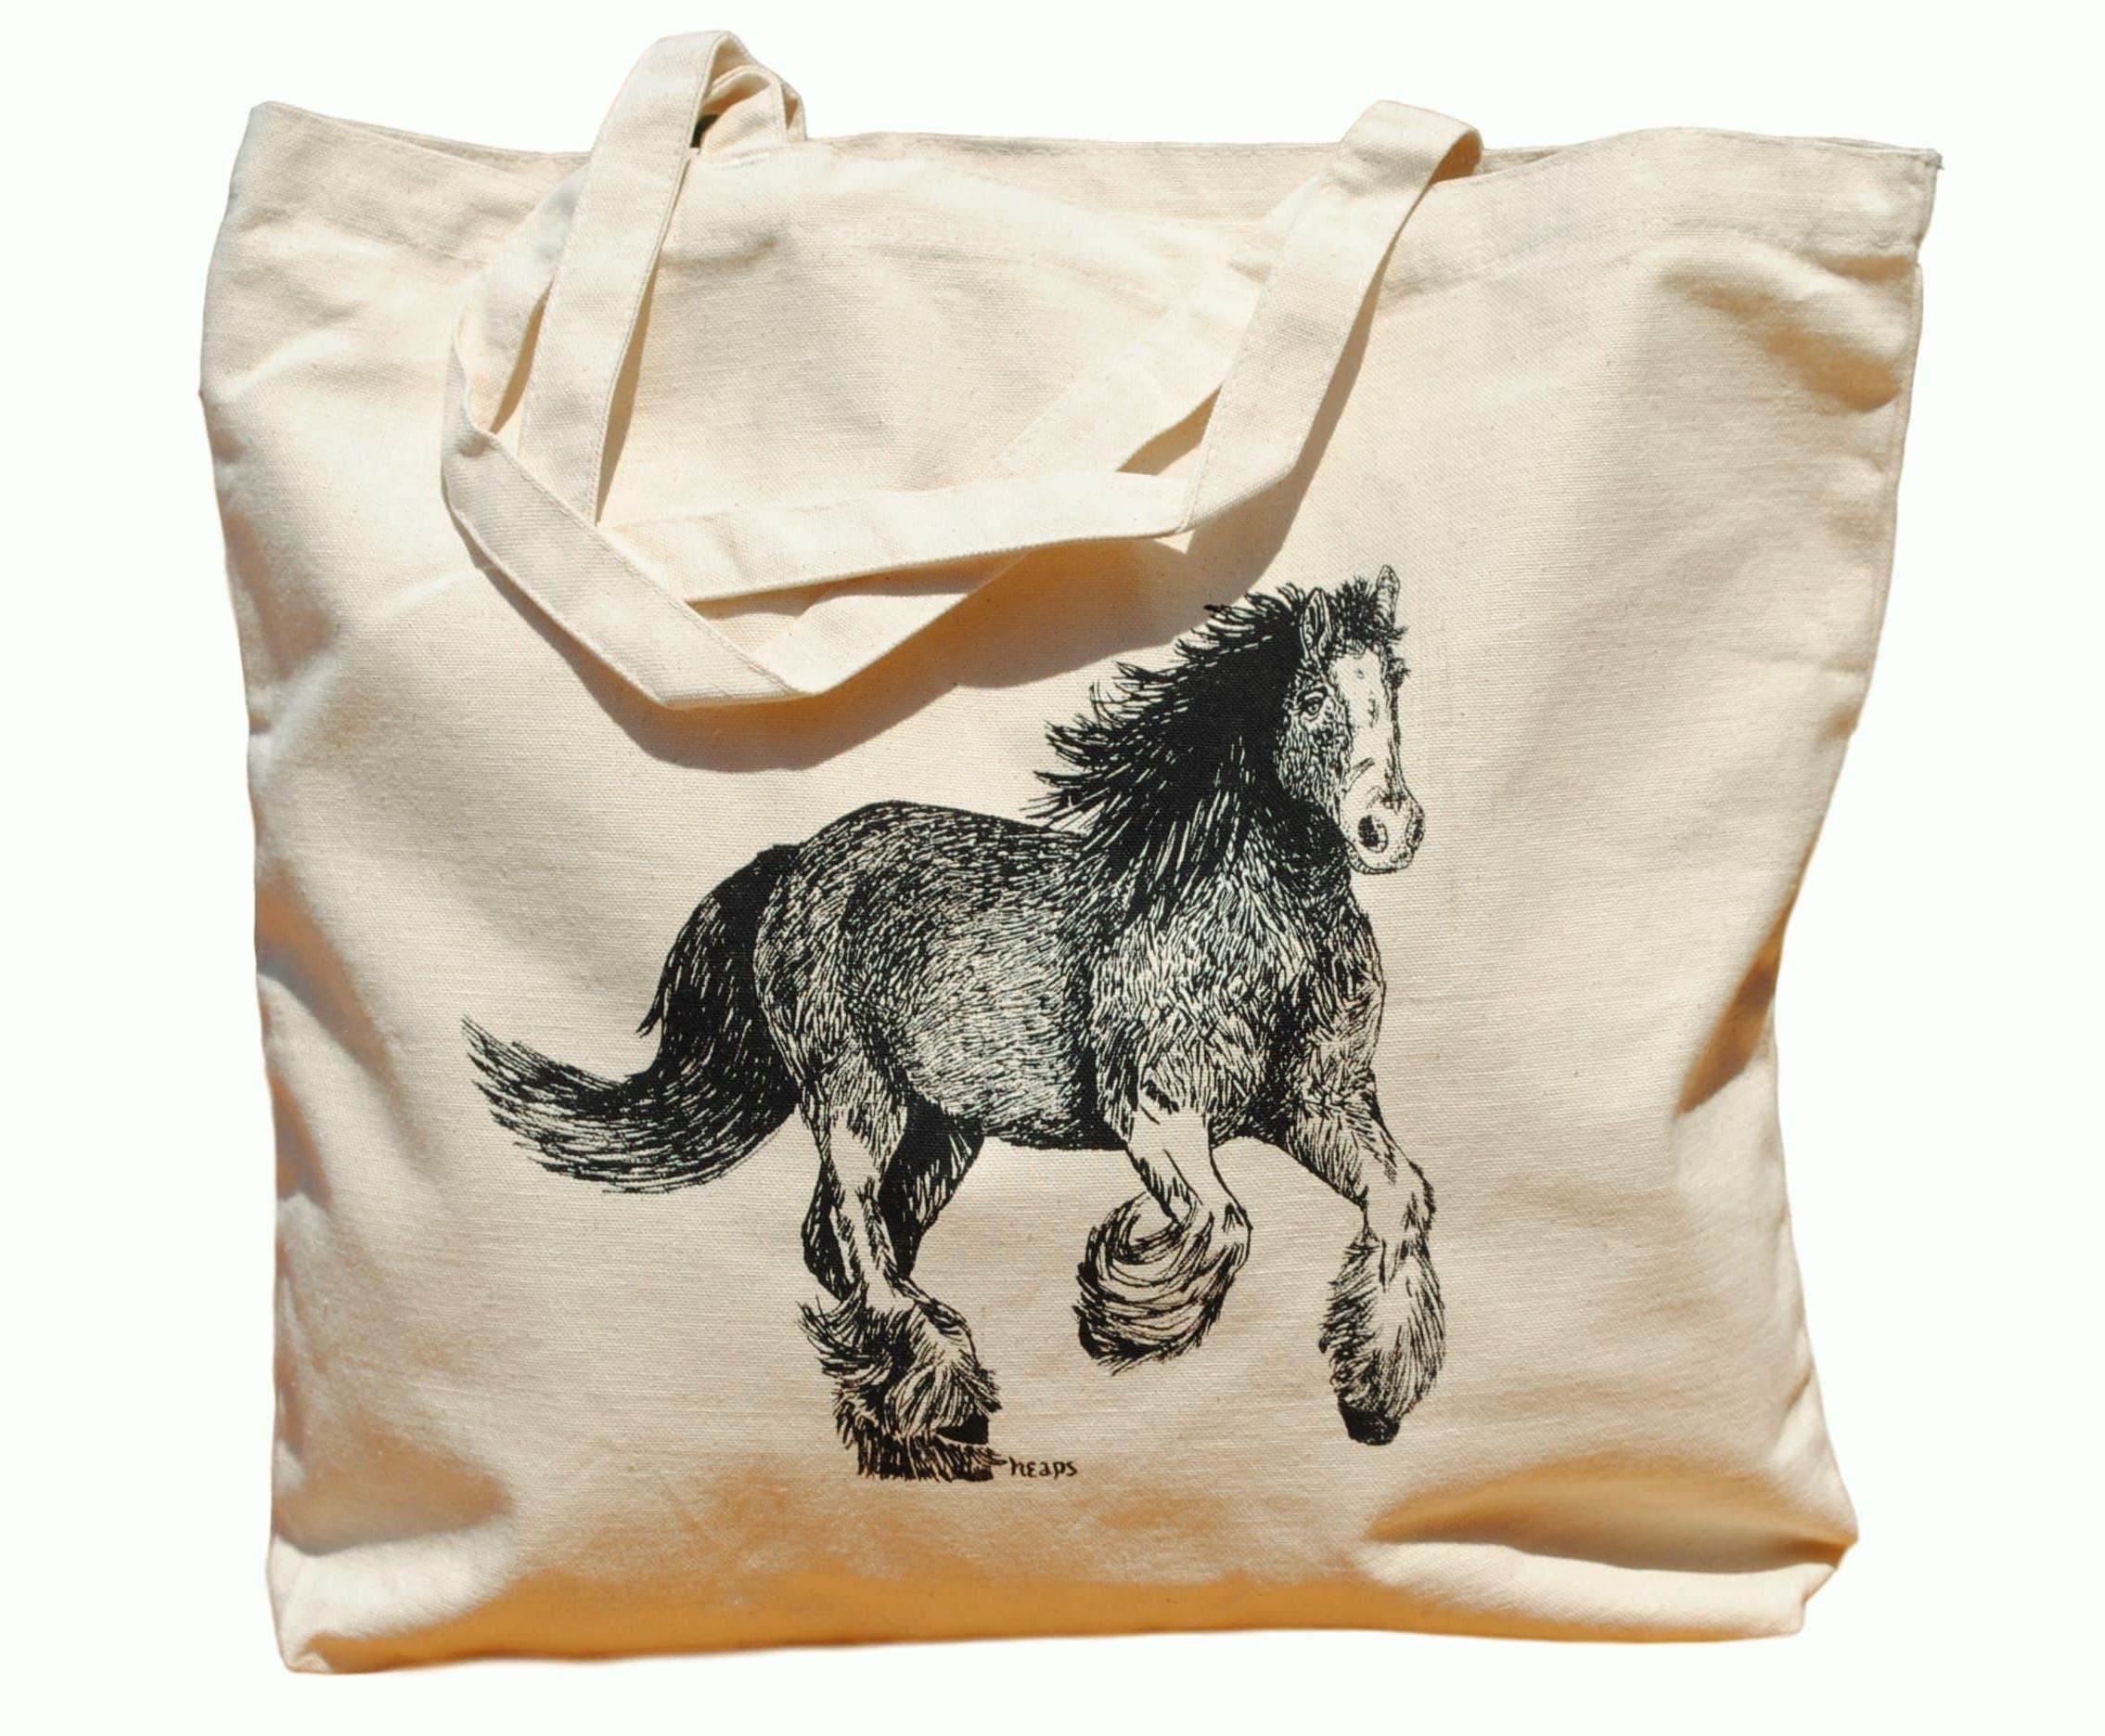 Clydesdales Horse Cotton Tote Bag - Canvas Tote - Horse Lover Gift - Bridesmaid Totes - Nautical Beach Destination Wedding Gift Bag